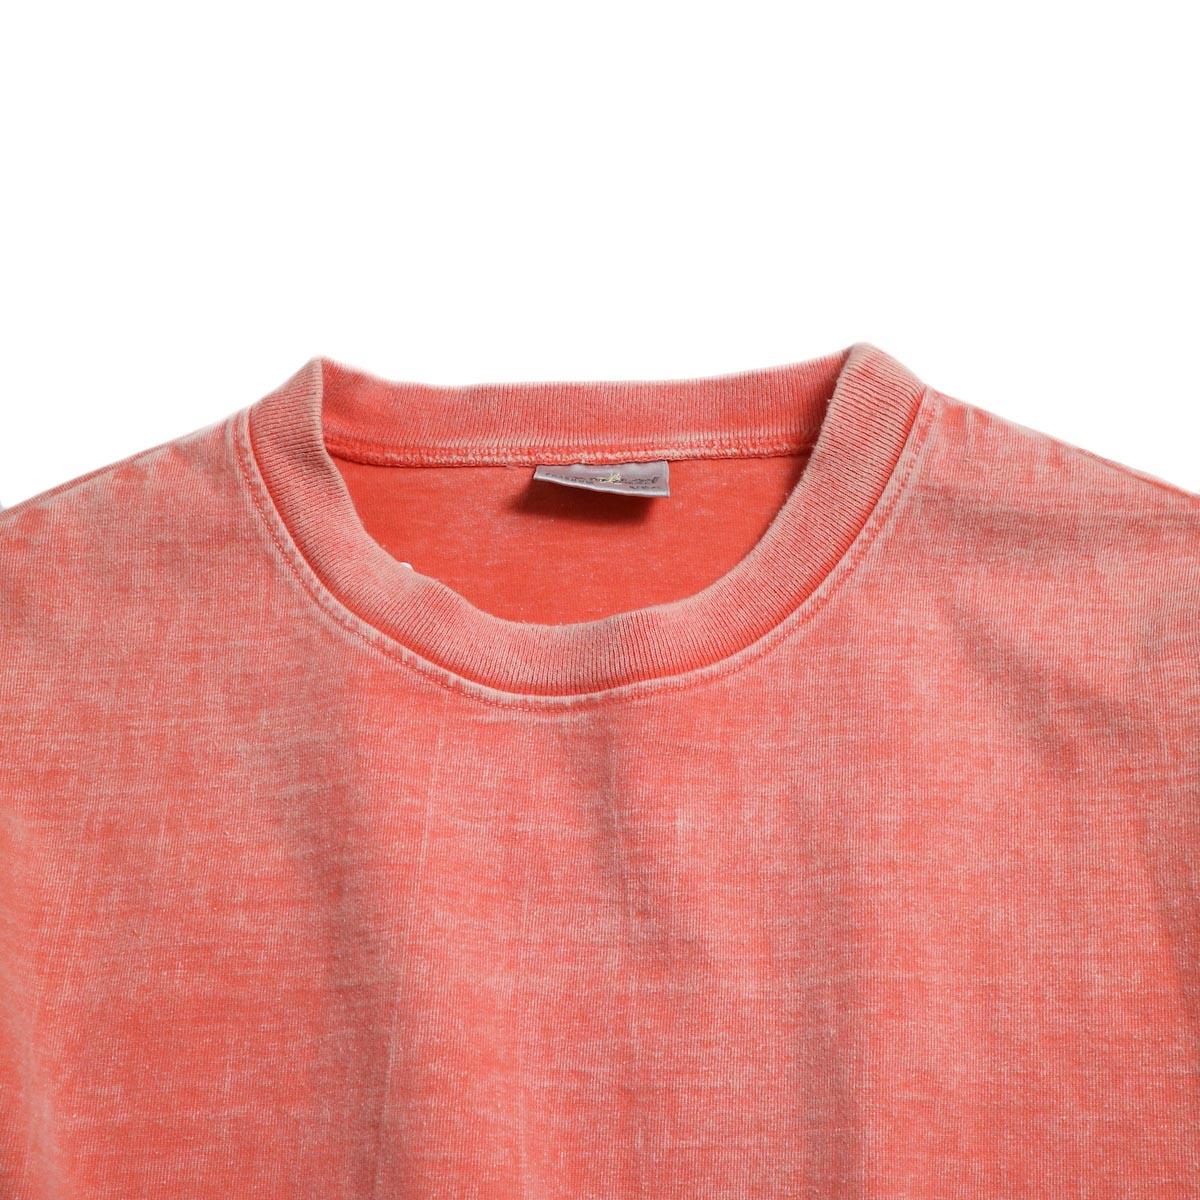 N.HOOLYWOOD × Gramicci  / 191-CS27-024 Short Sleeve Tee -Pink 襟